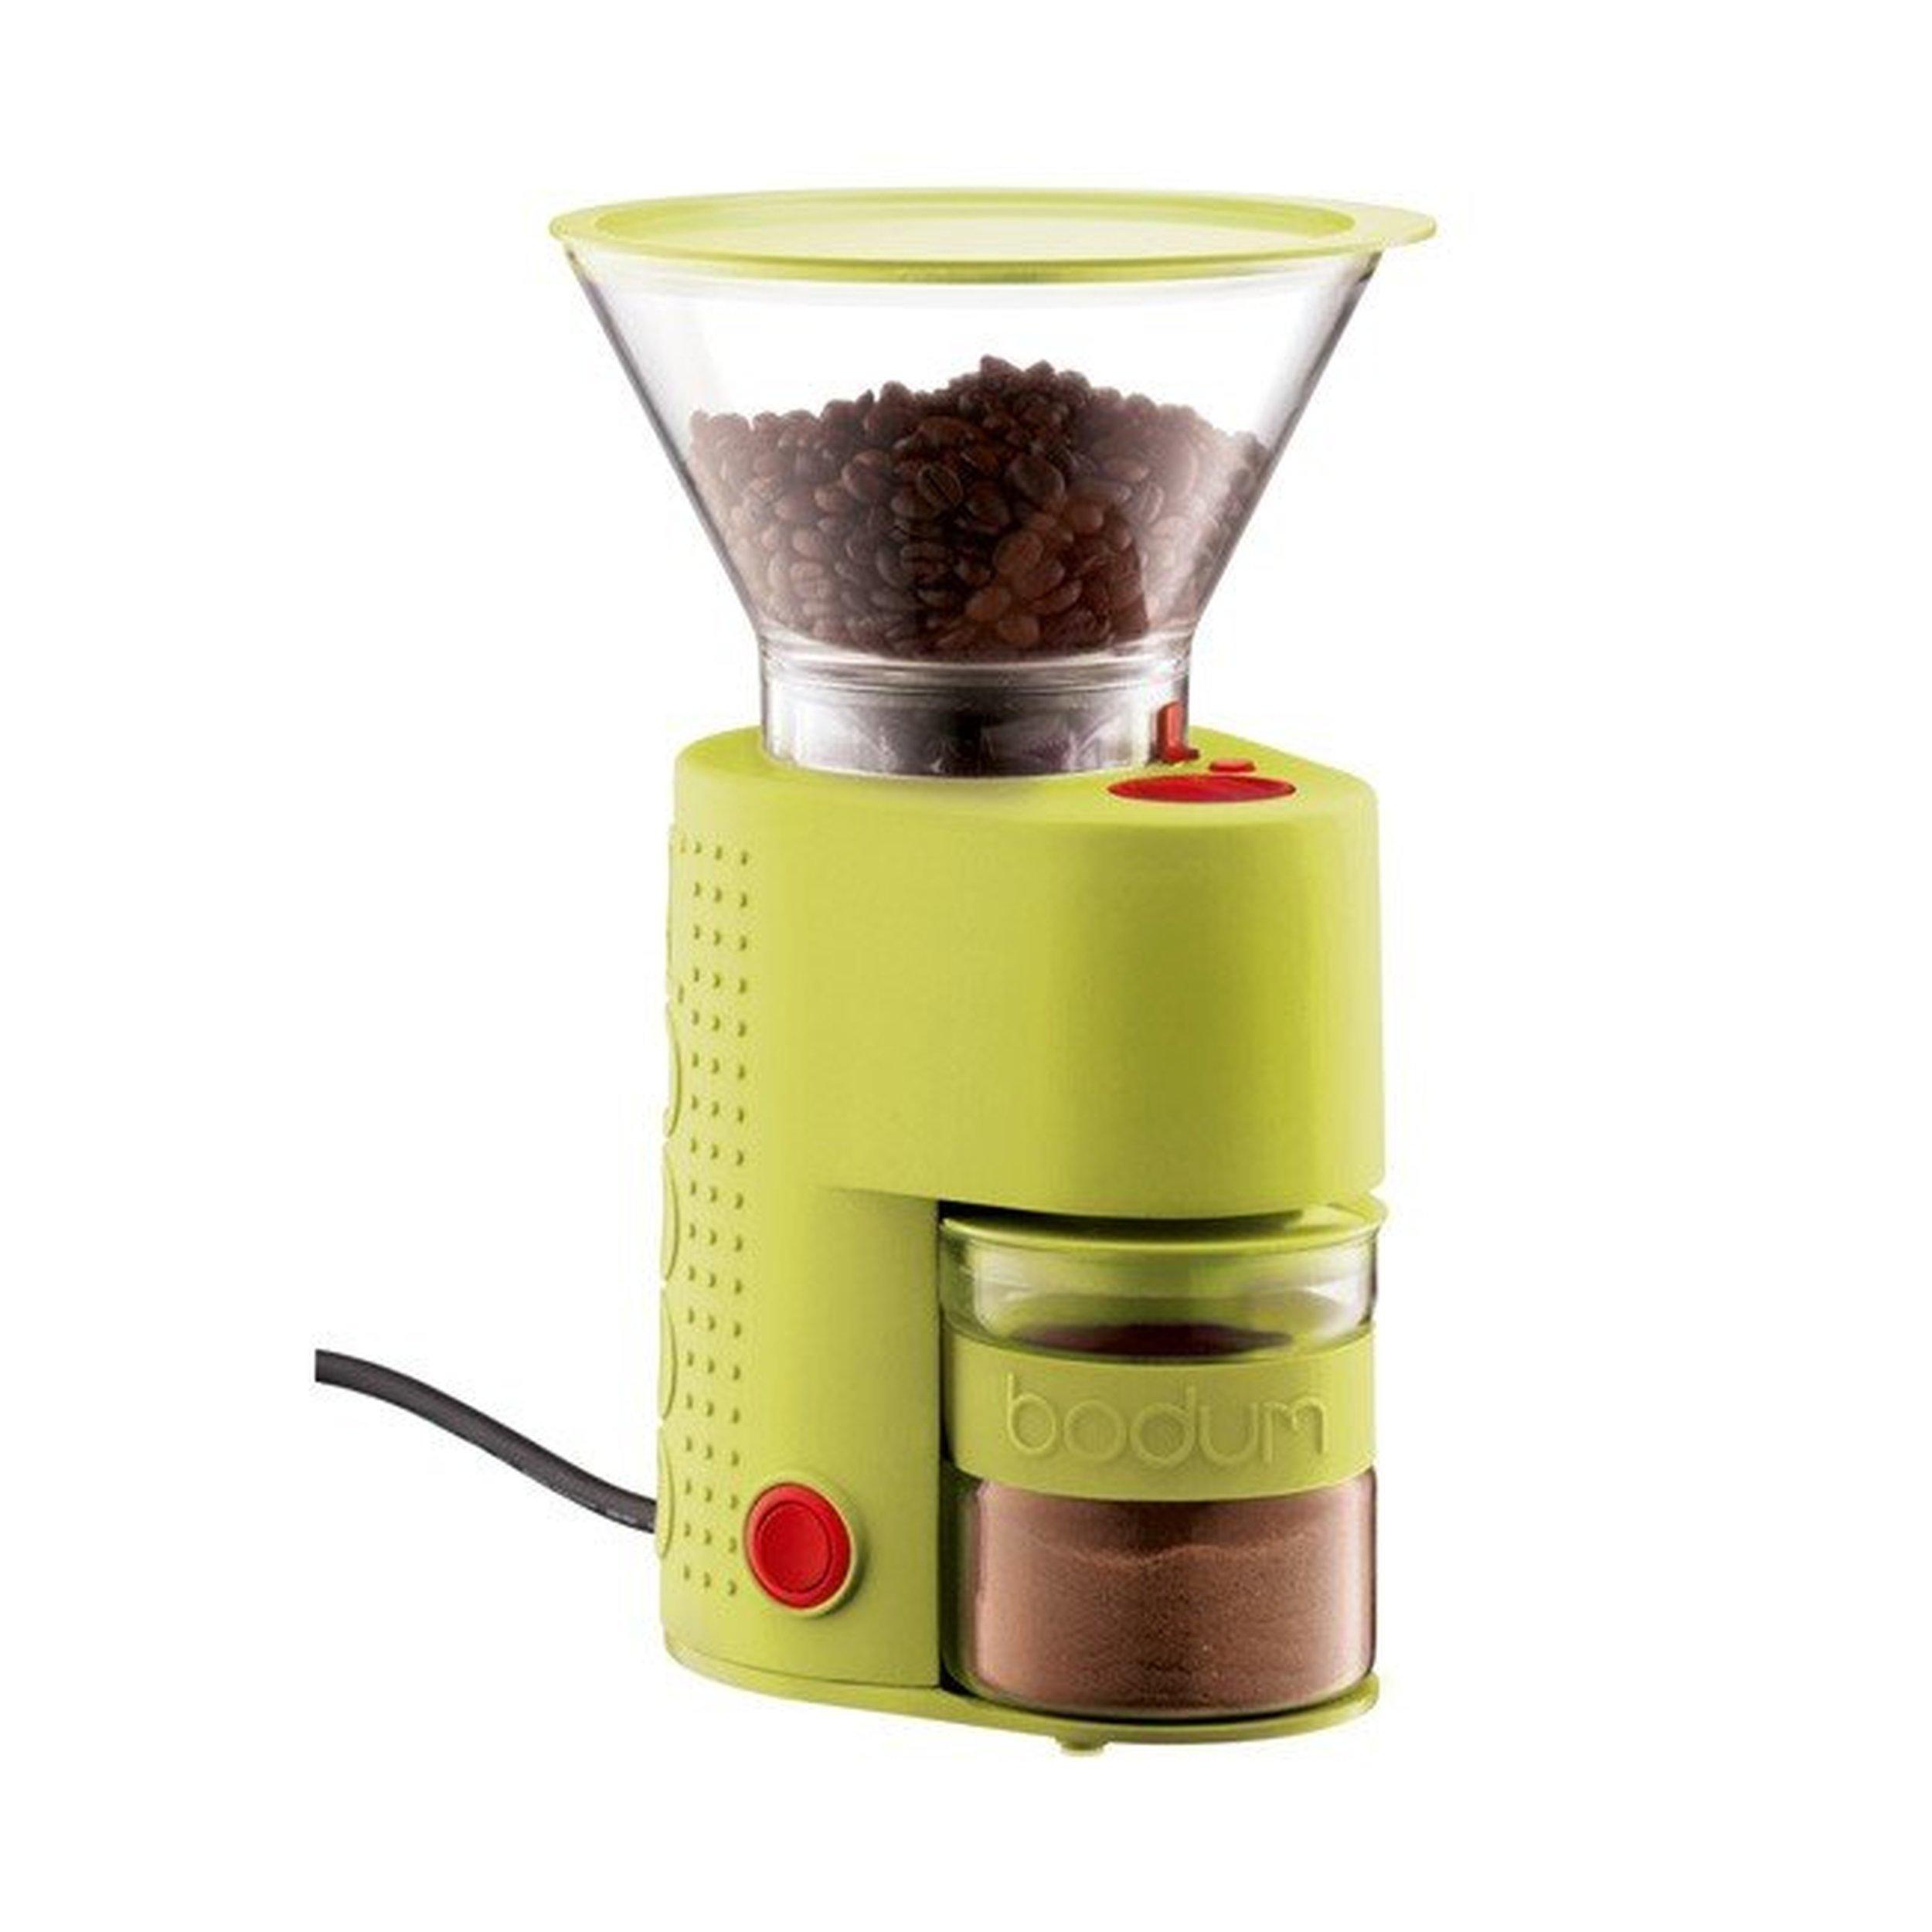 Bodum Coffee Grinder Static